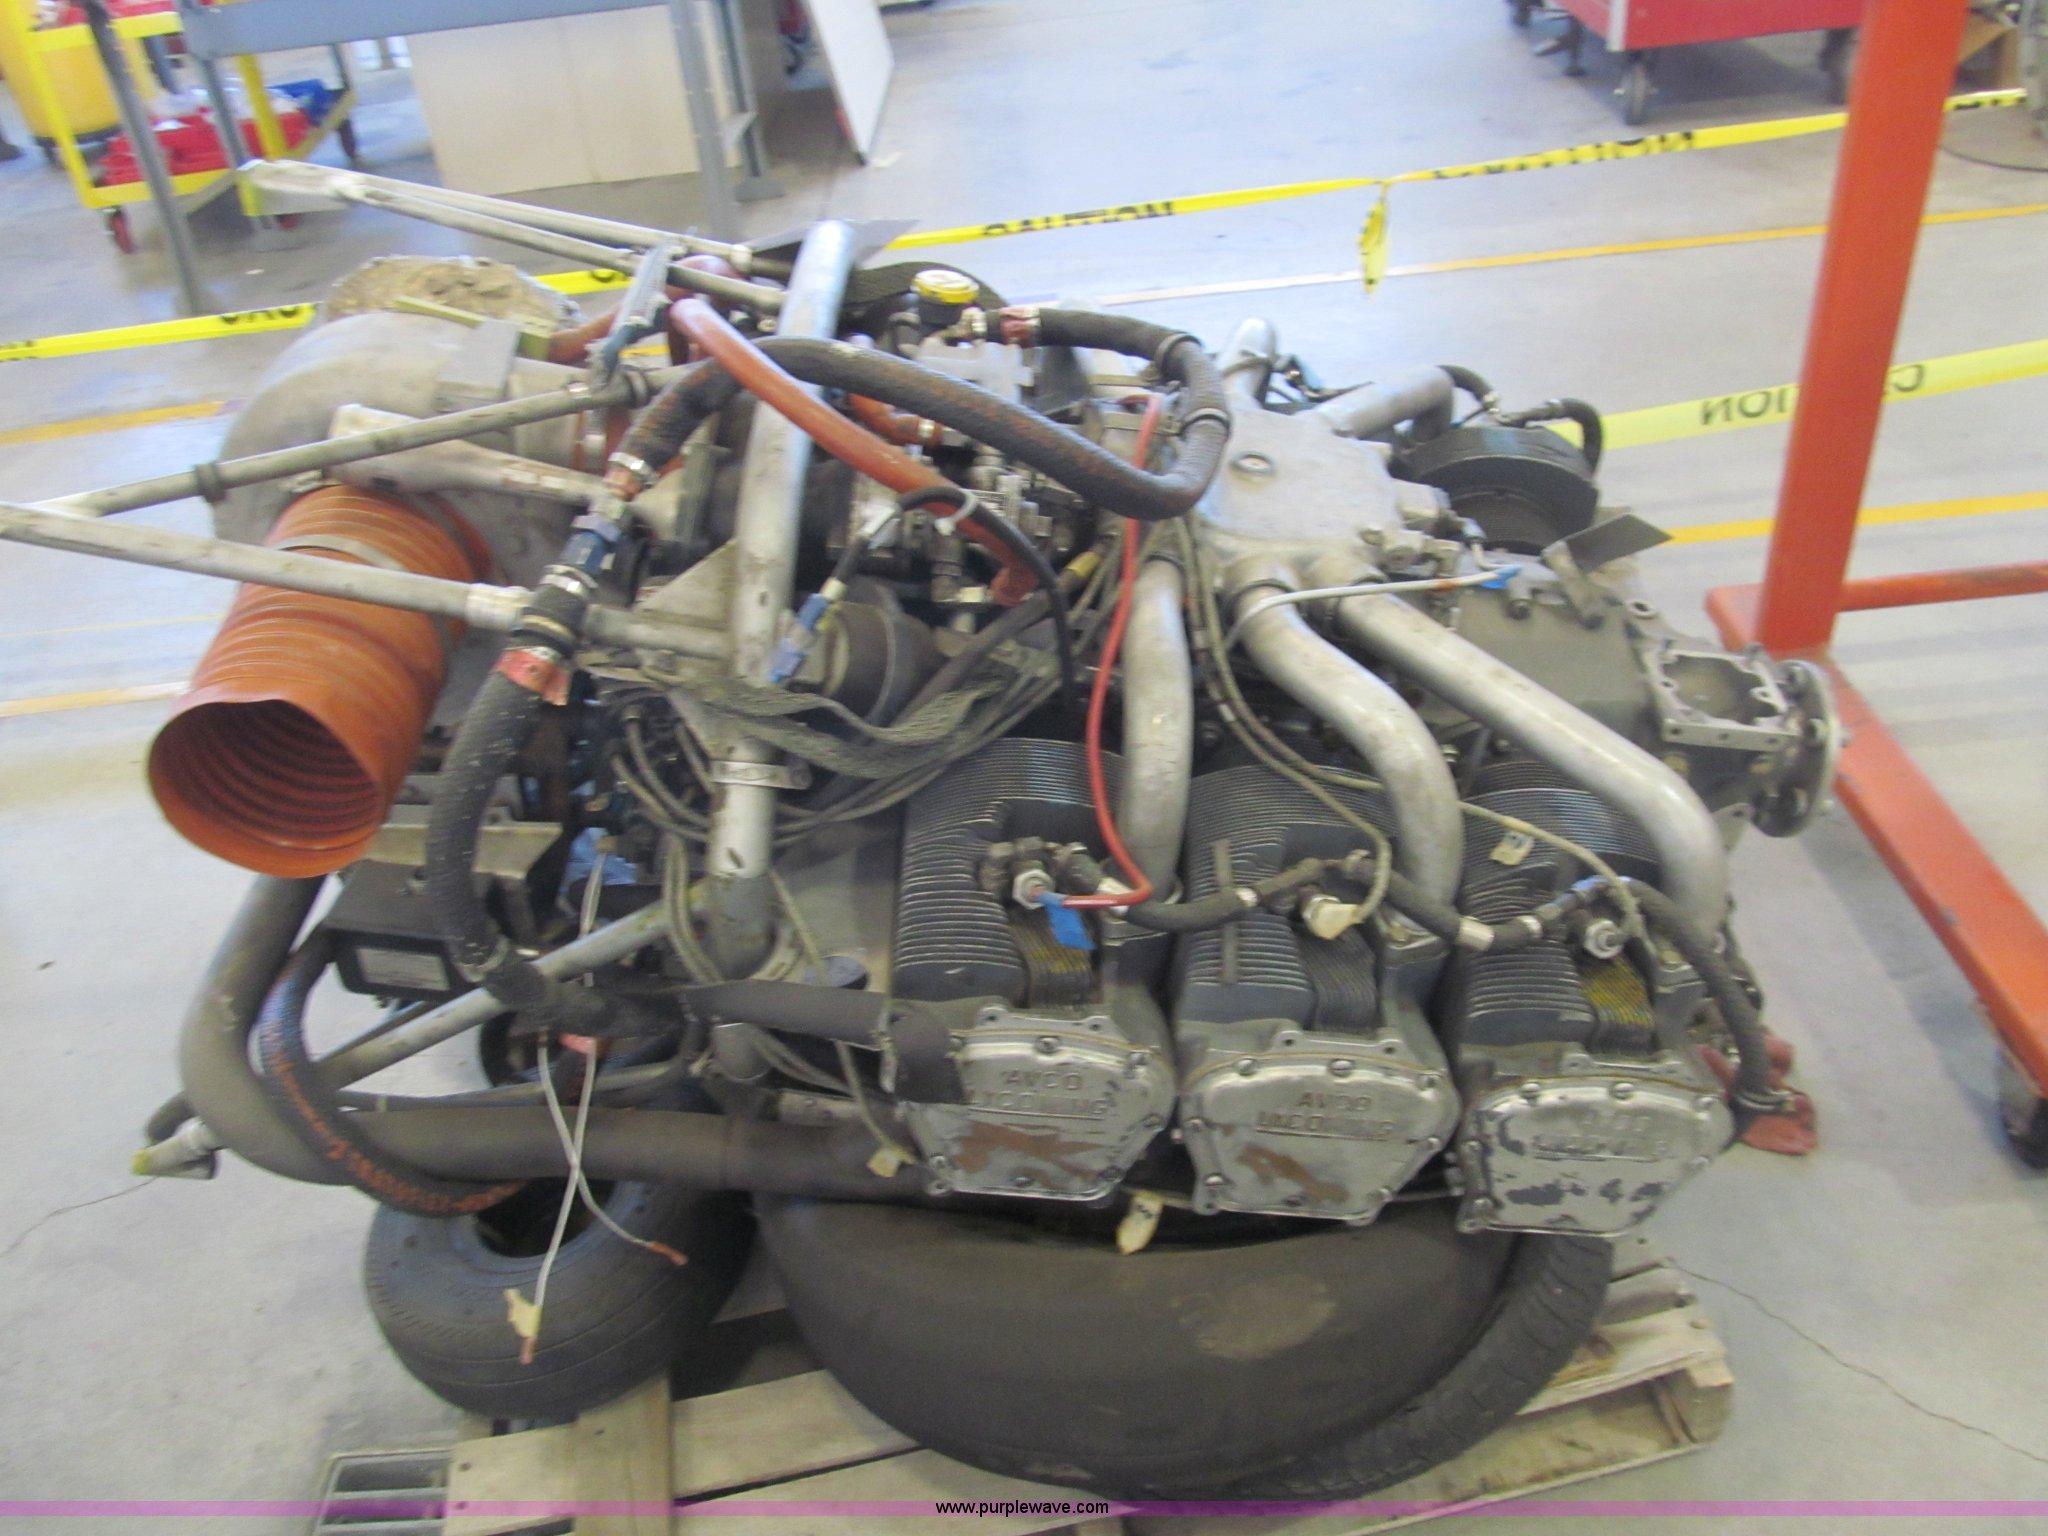 Lycoming aircraft engine | Item AY9243 | SOLD! July 8 Govern